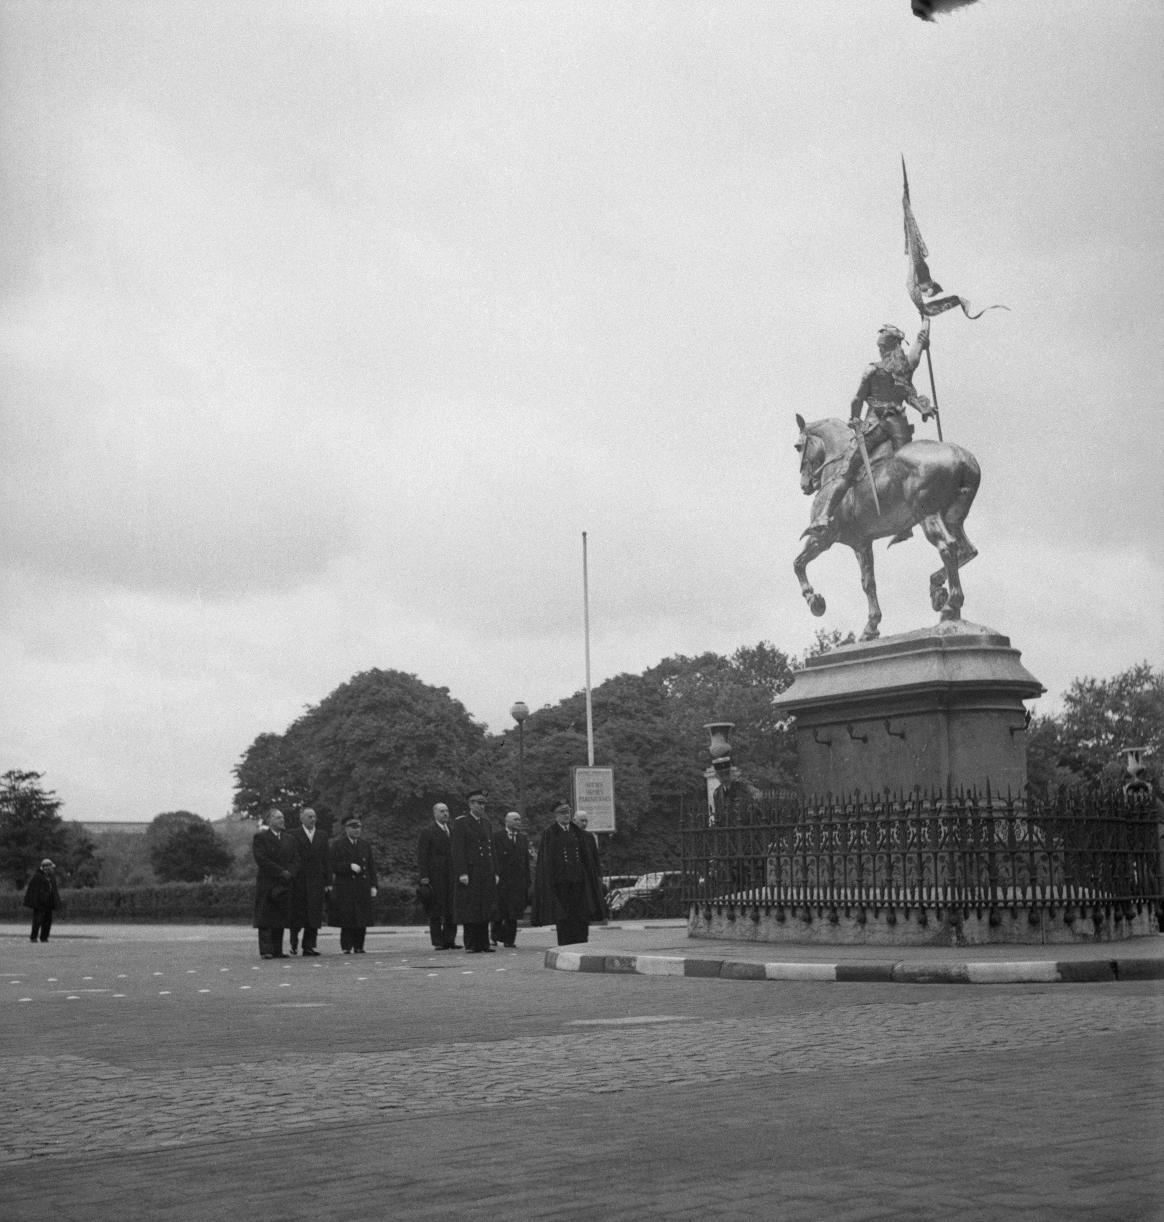 007. Перед монументом Жанны д'Арк, Площадь Пирамид